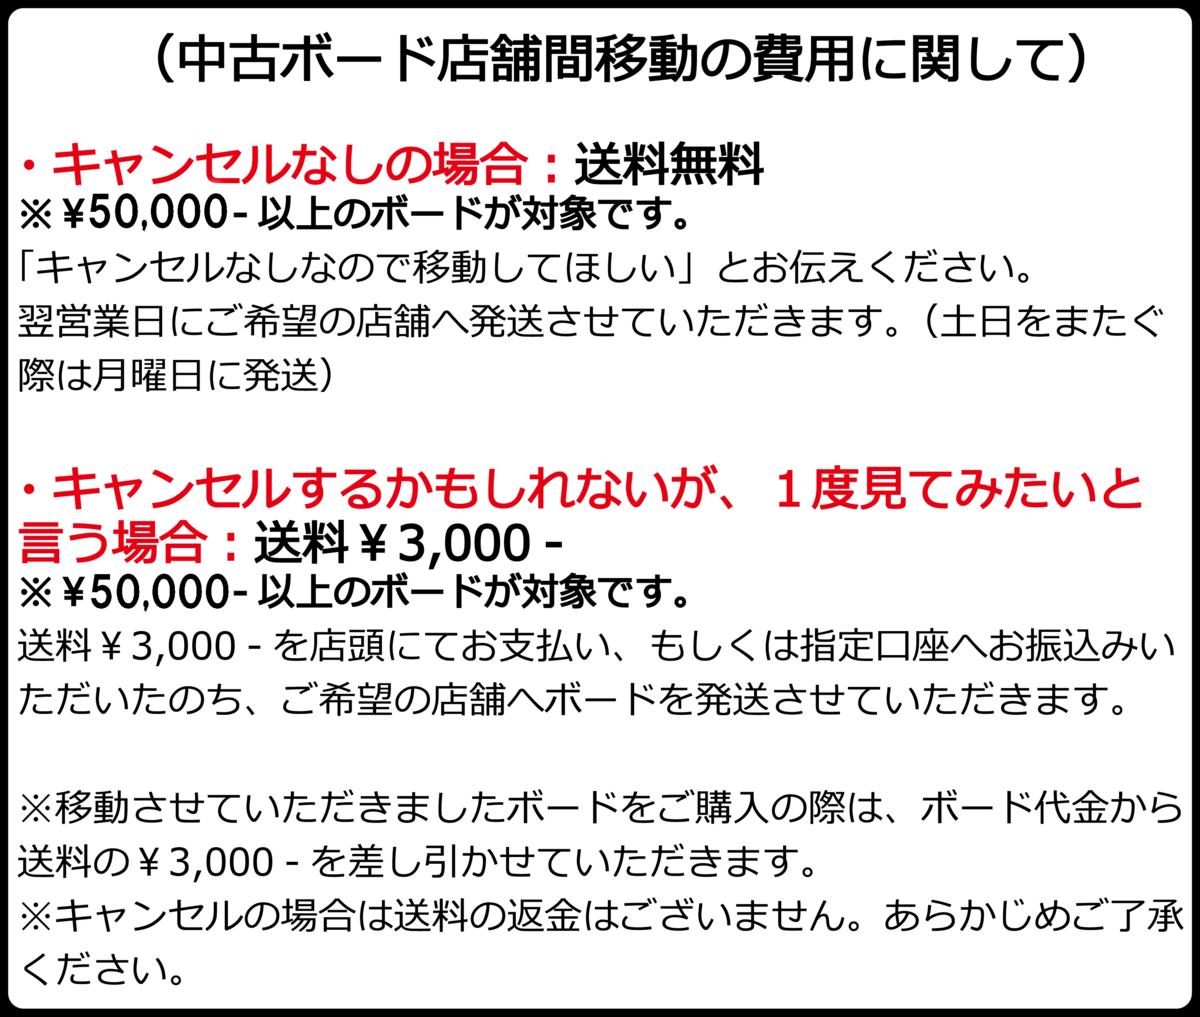 f:id:SEAKONG:20200531095353p:plain